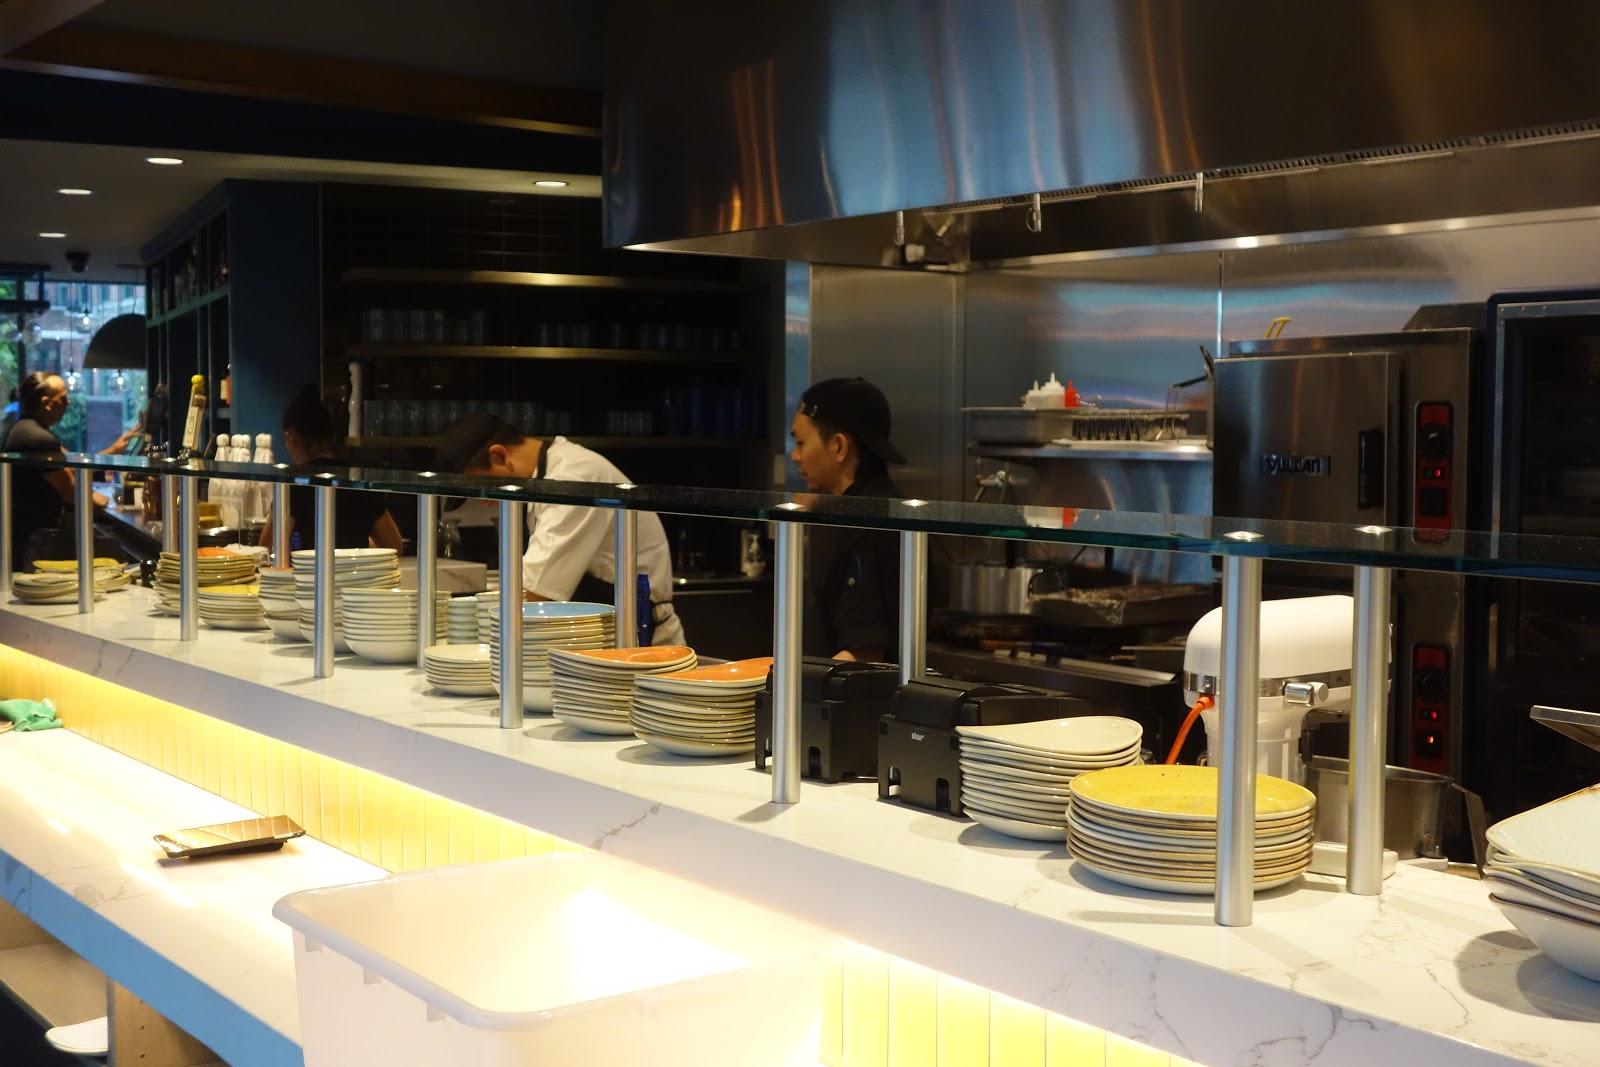 The Passionate Foodie: Sumiao Hunan Kitchen: An Impressive